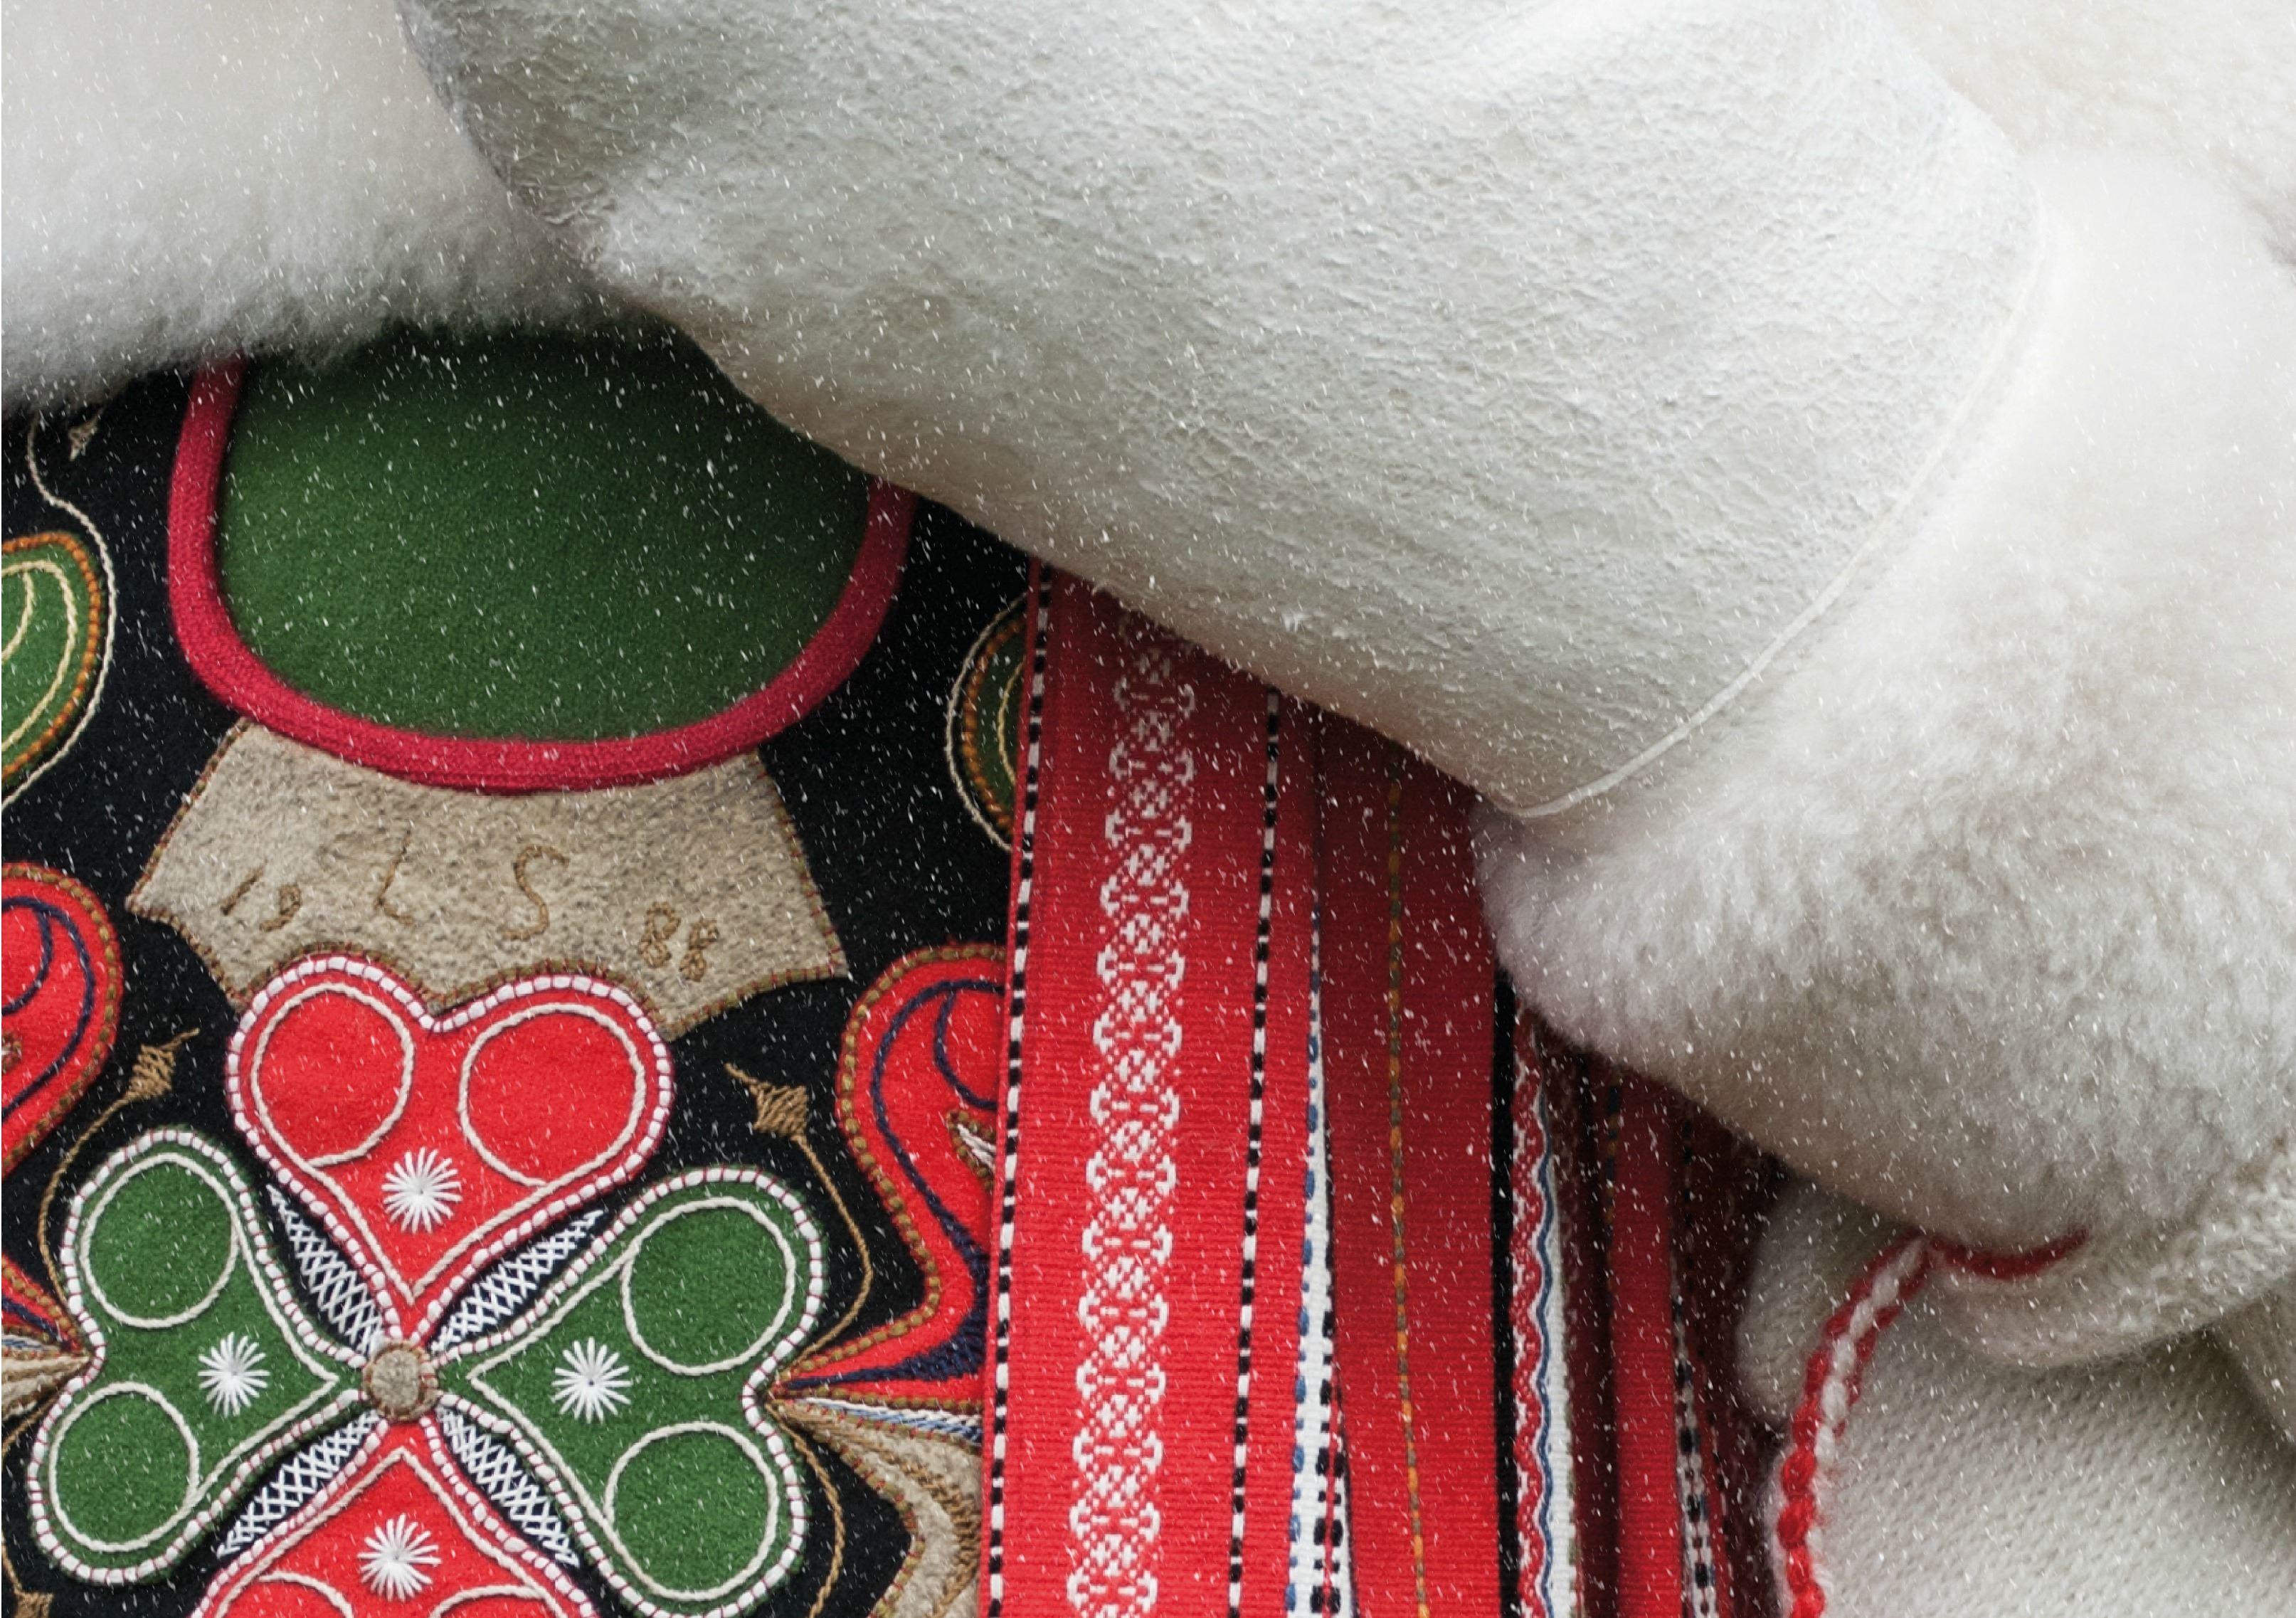 Leksand's Christmas Market